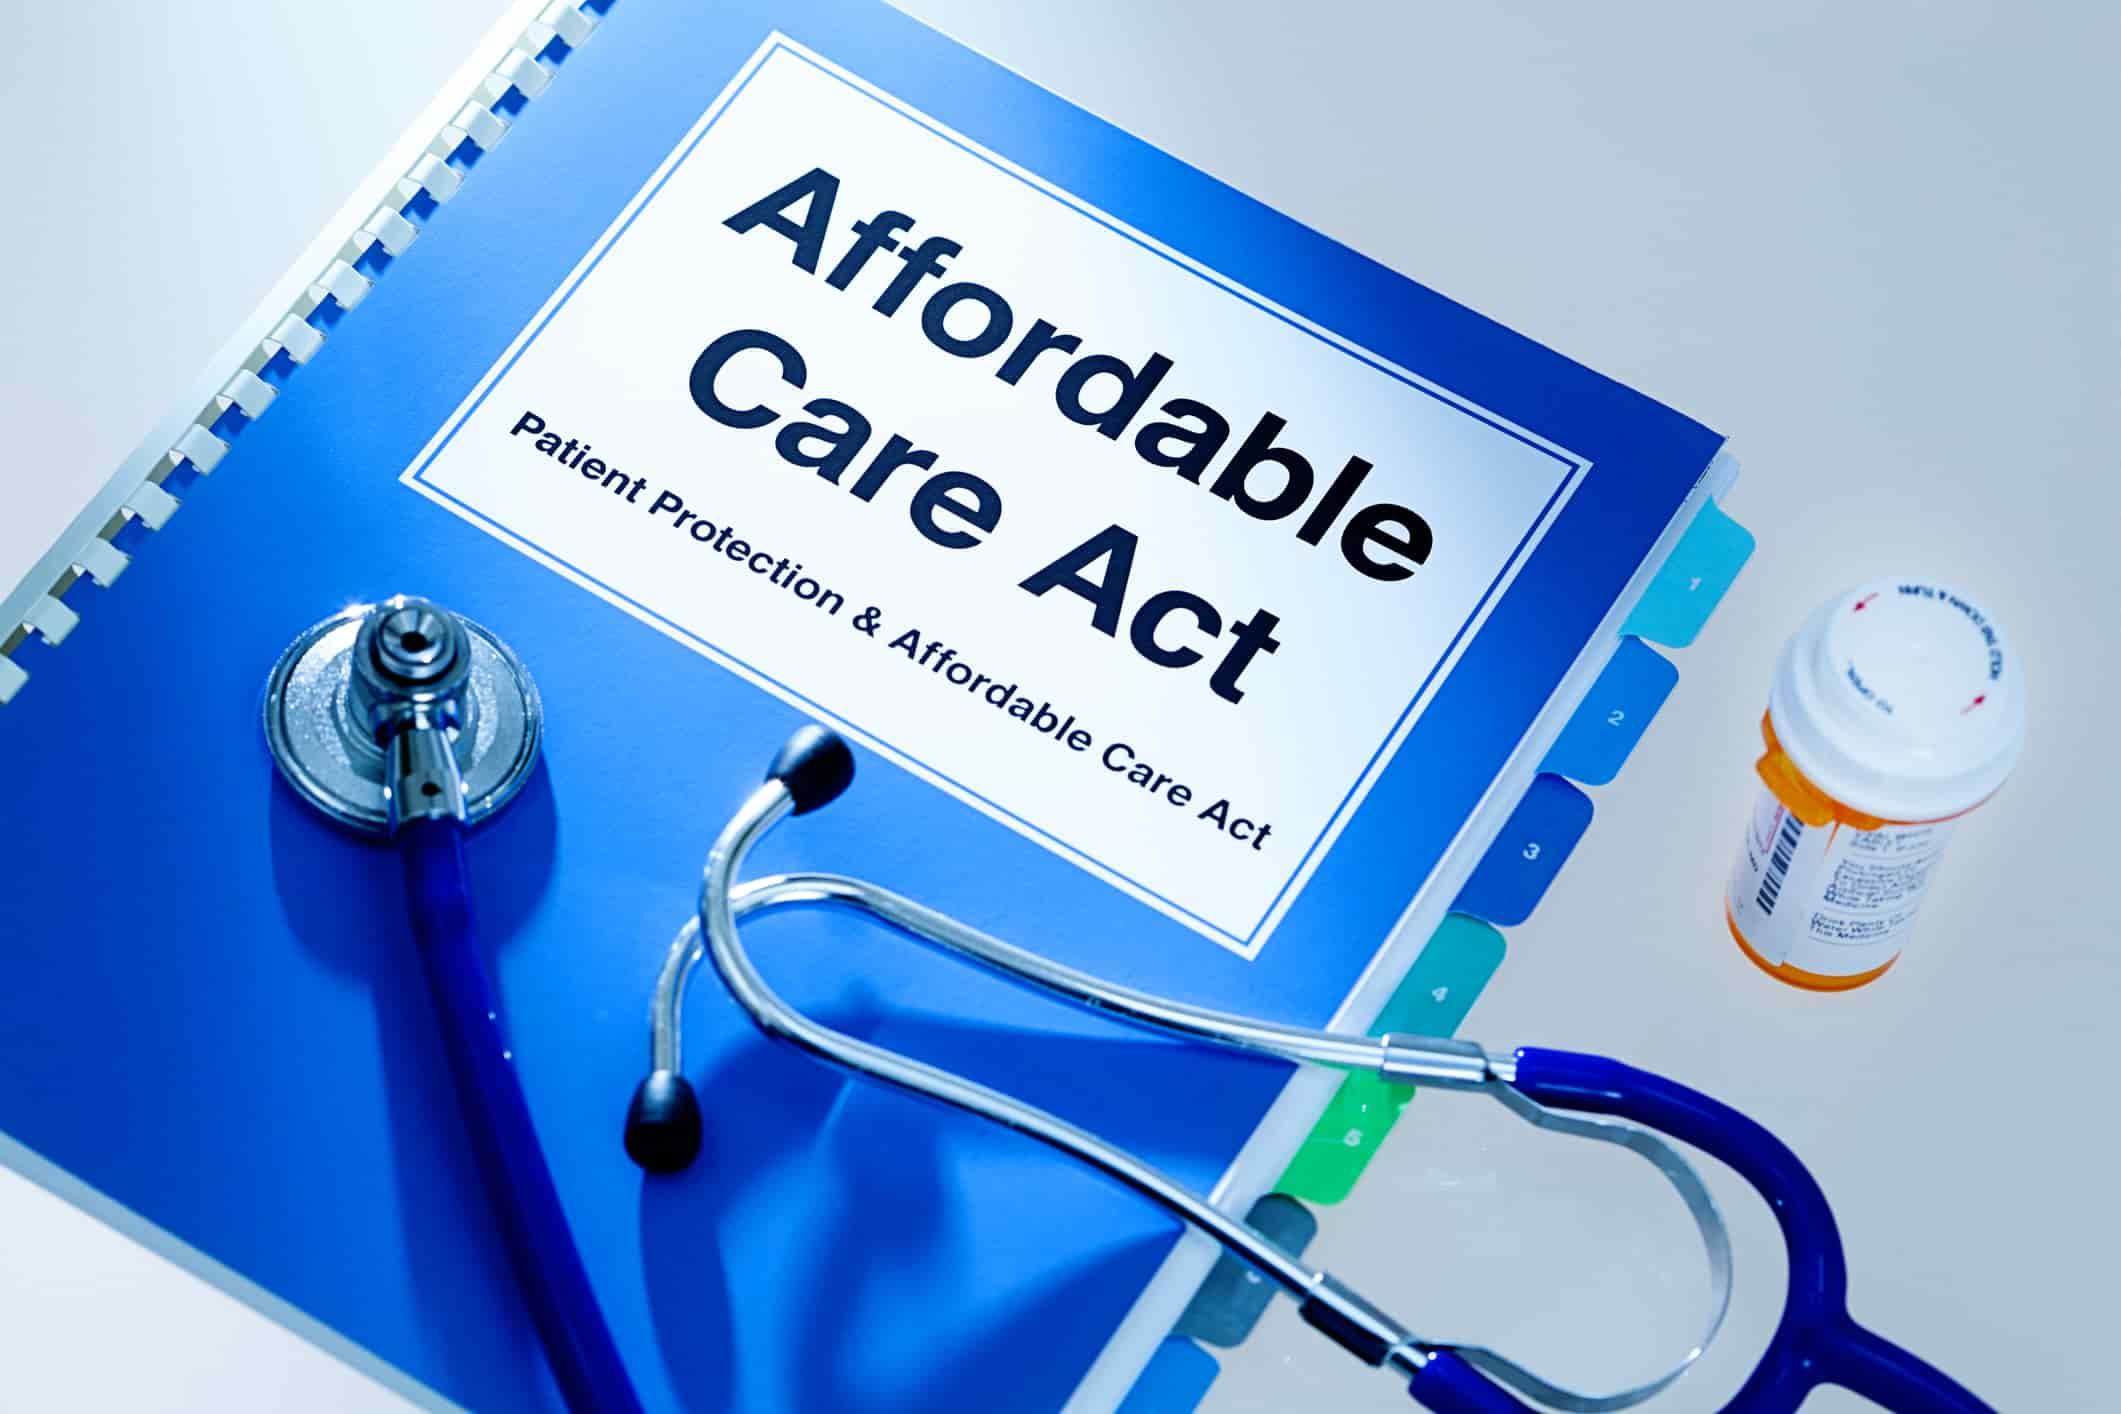 Supreme Court to Hear Oral Arguments on Obamacare in November